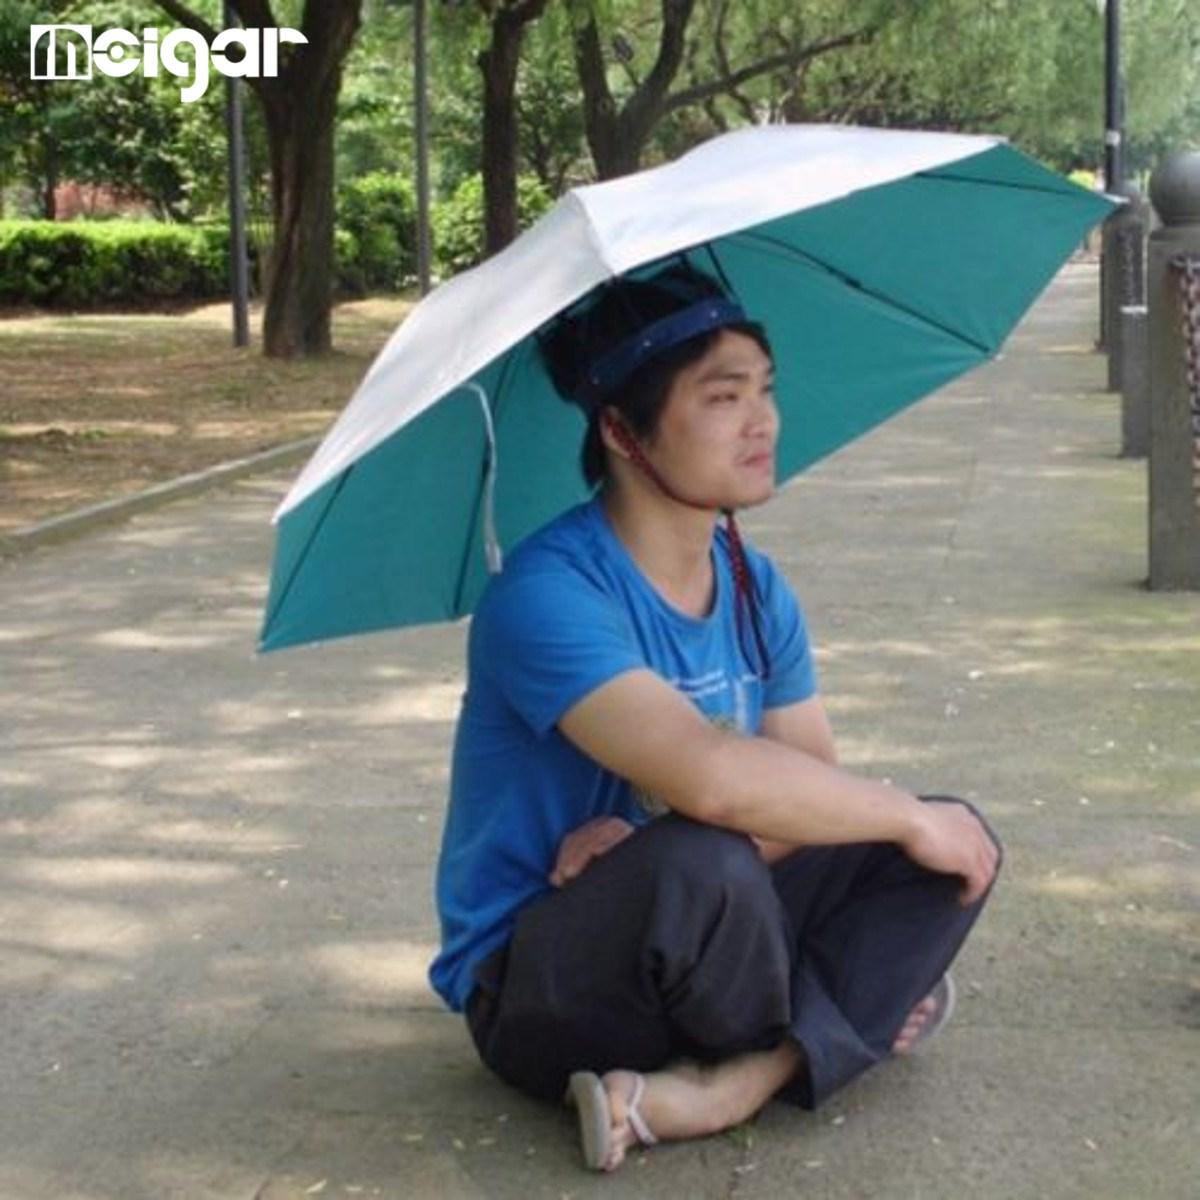 5024ada54dfa2 Large Fishing Hunting Umbrella Unisex Umbrella Hat Paras UV Proof Bumber  Paraguas Outdoors Rain Gear Sun Protection